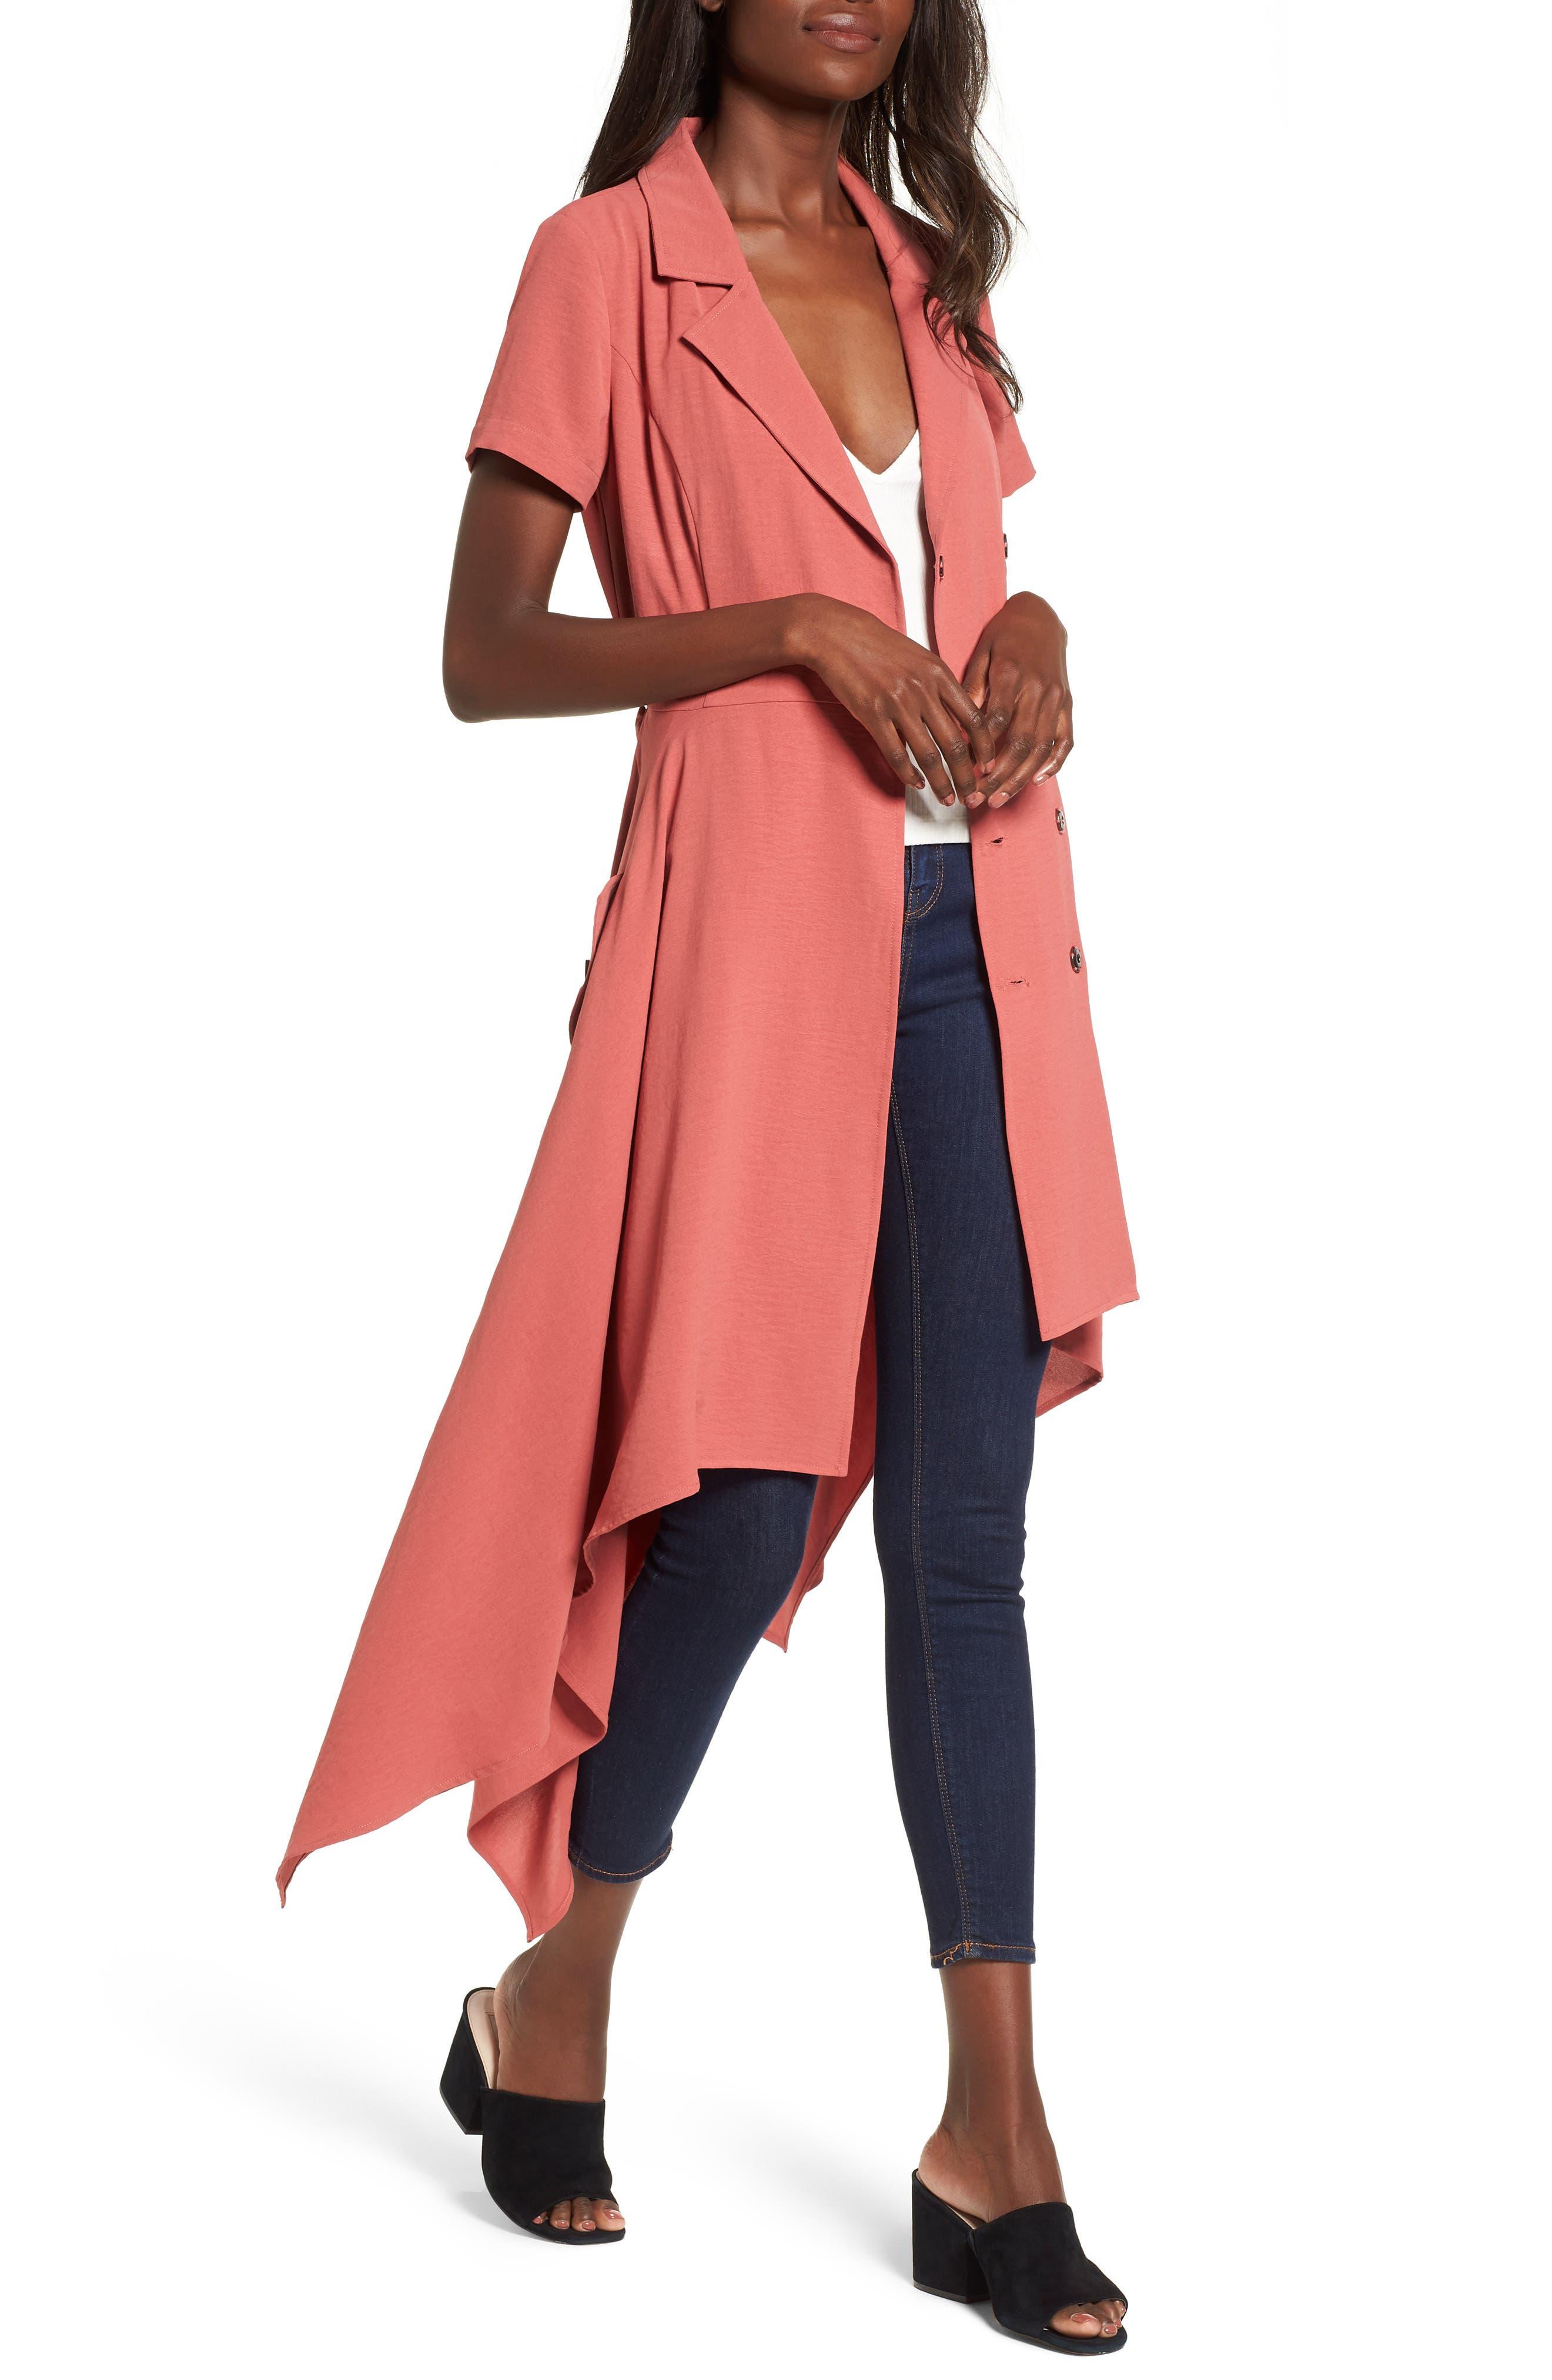 Chriselle x J.O.A. Asymmetrical Trench Dress,                             Alternate thumbnail 3, color,                             Patina